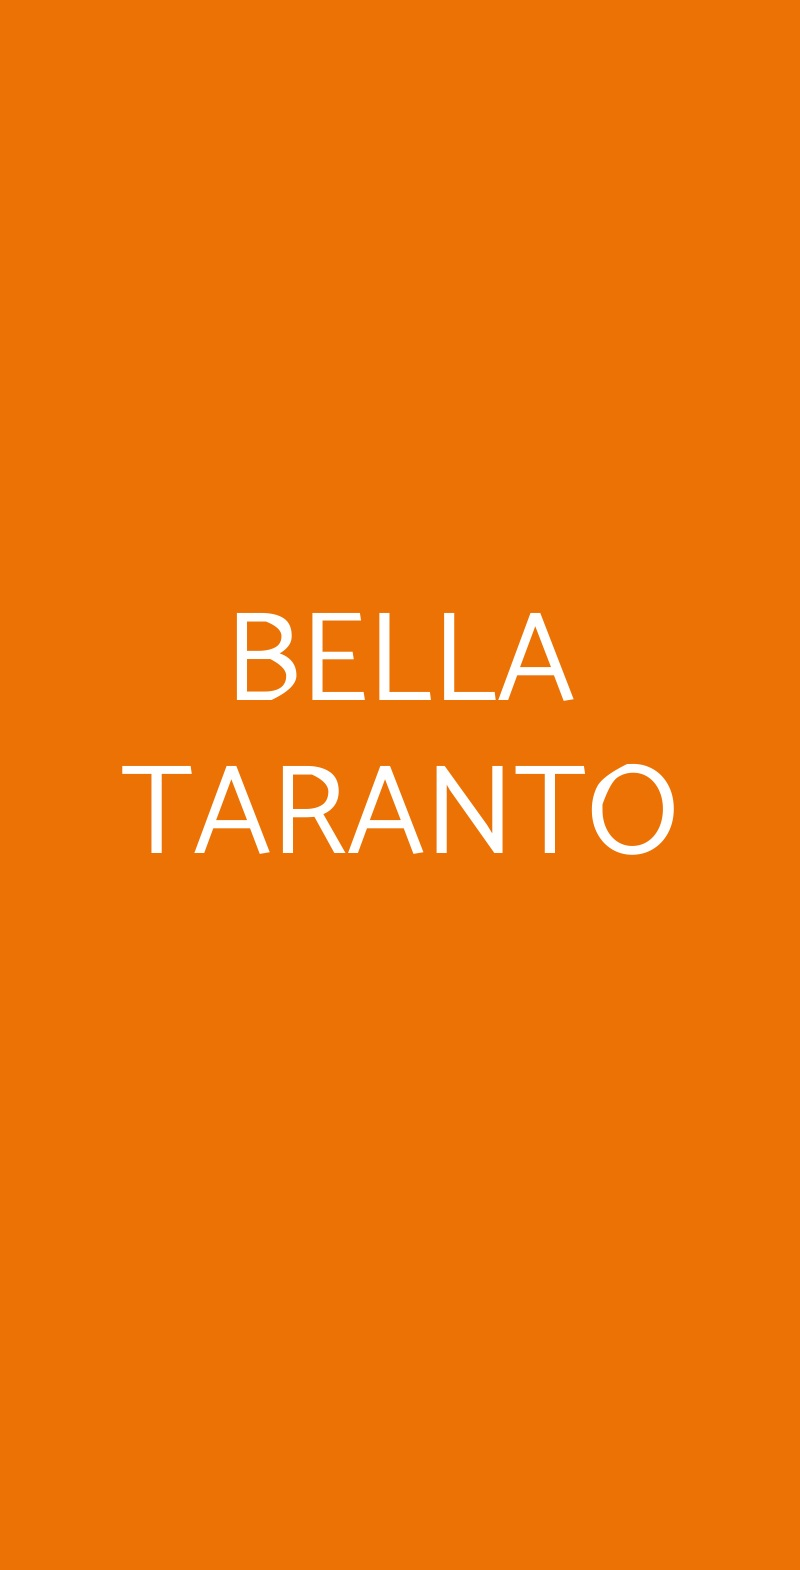 BELLA TARANTO Bologna menù 1 pagina